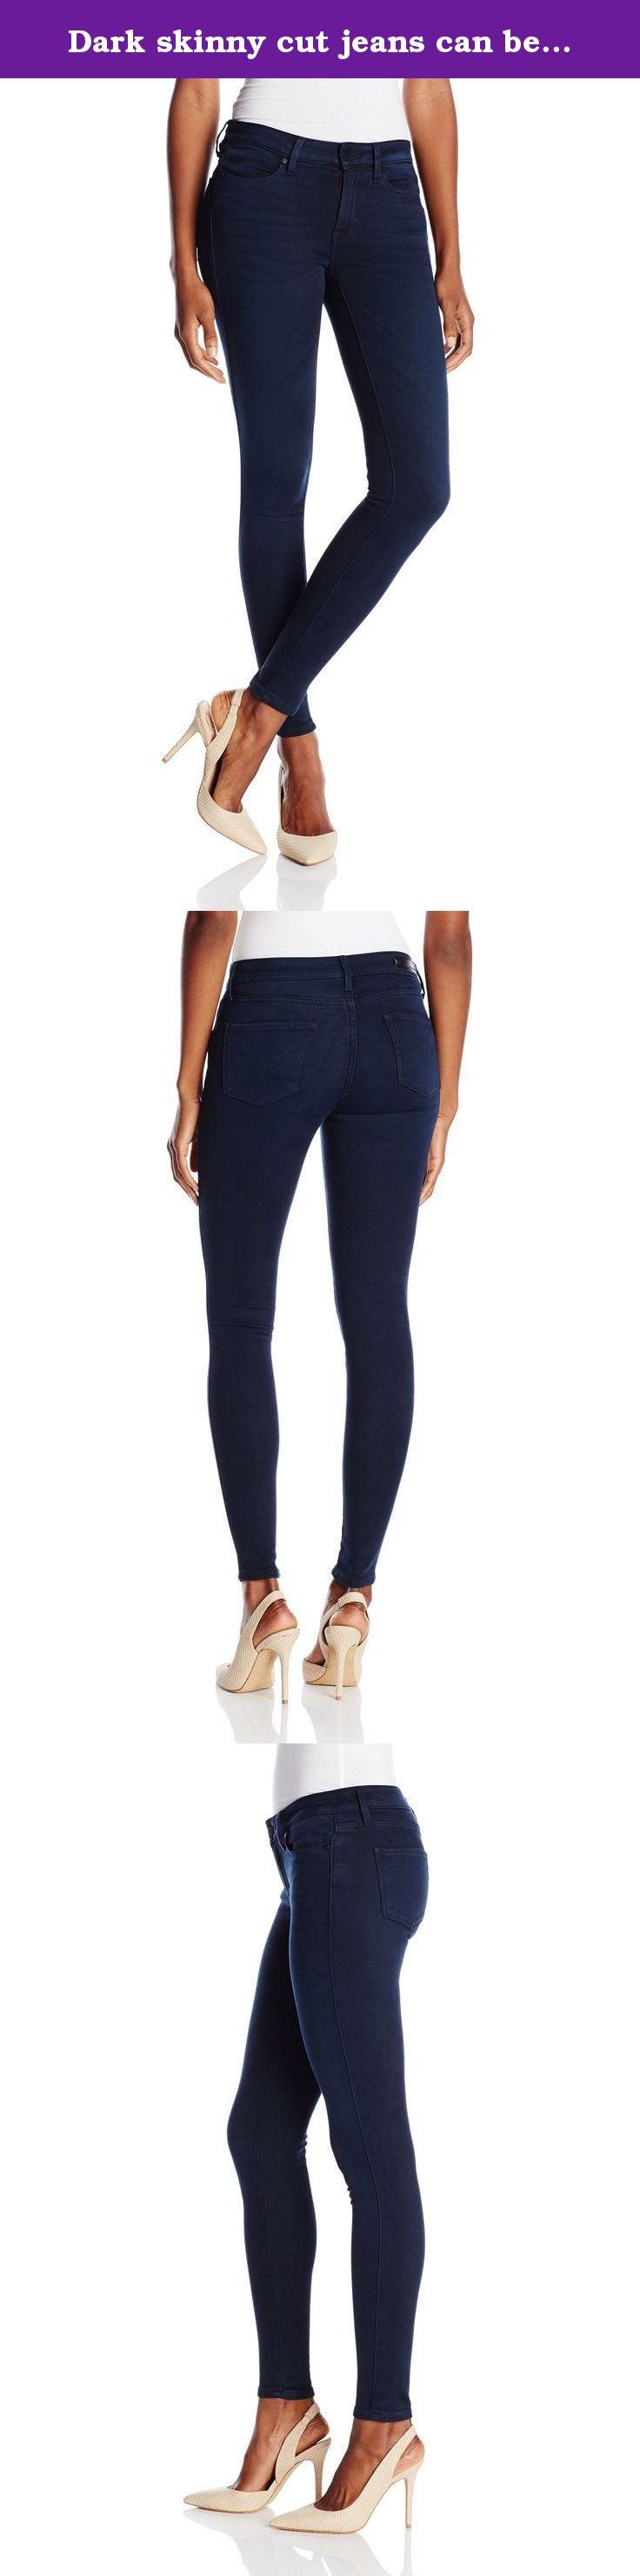 Dark skinny cut jeans can be instantly flattering. Knit denim.